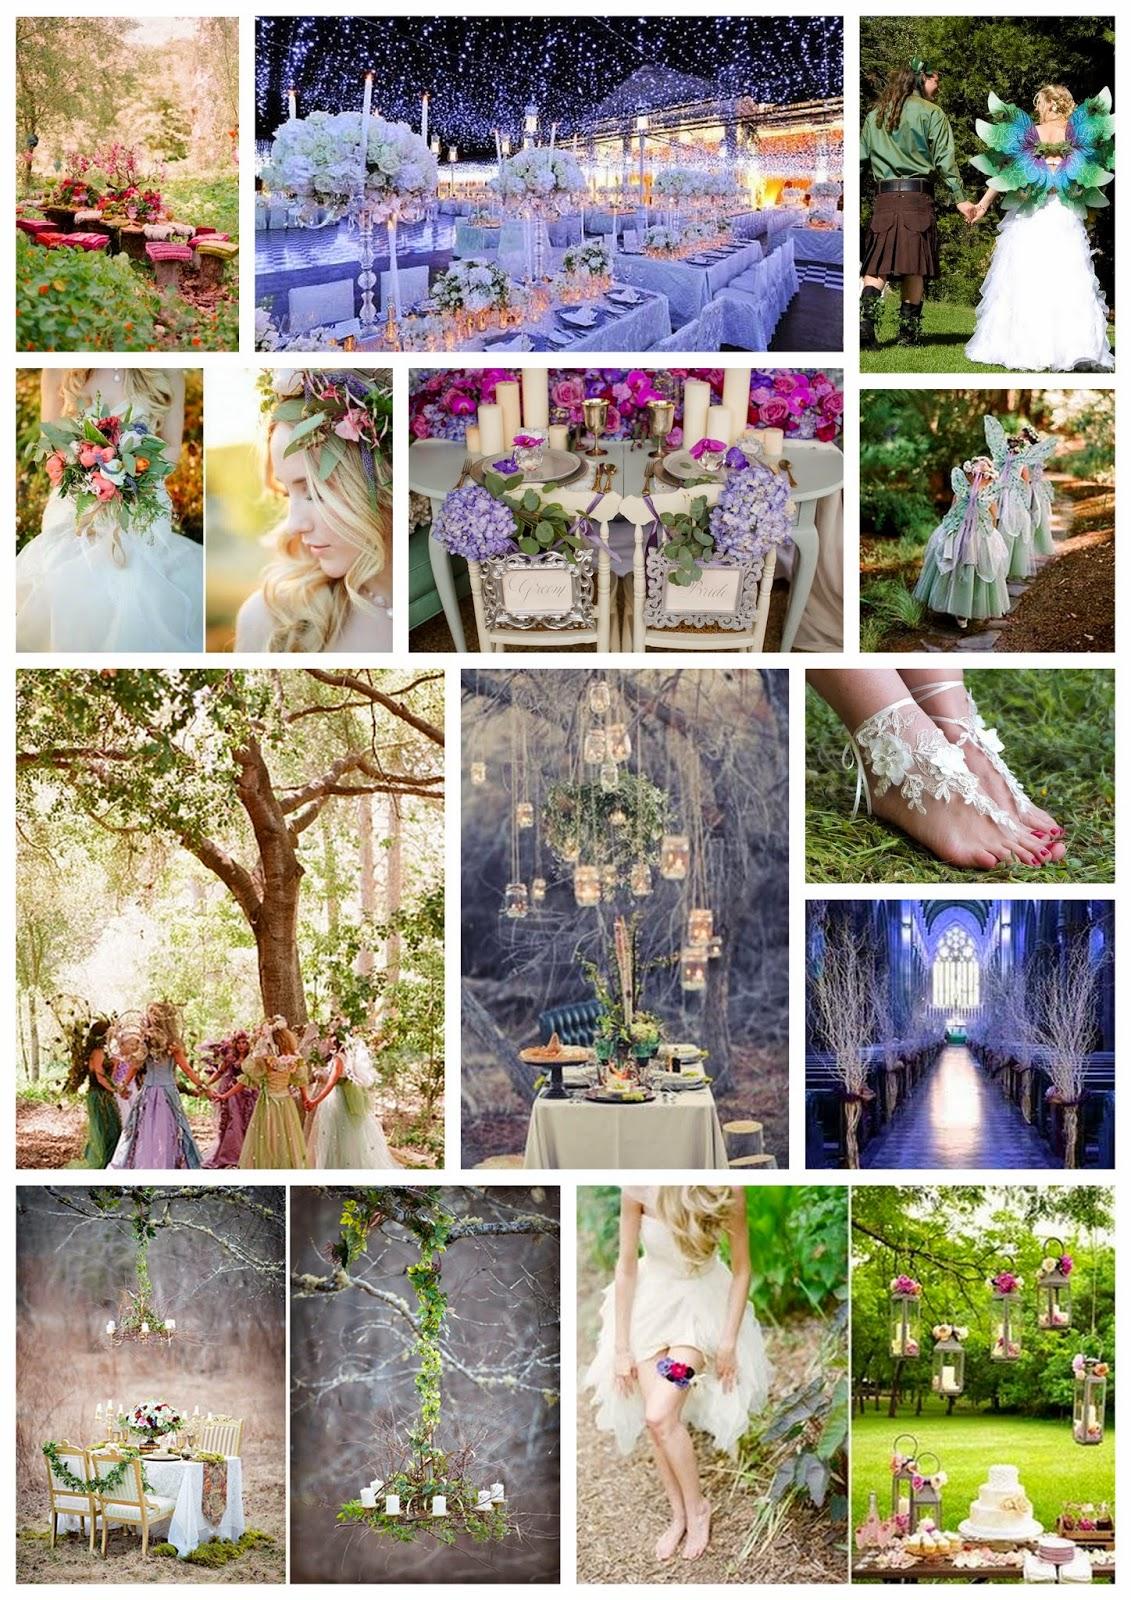 Matrimonio Tema Fate : I temi del matrimonio